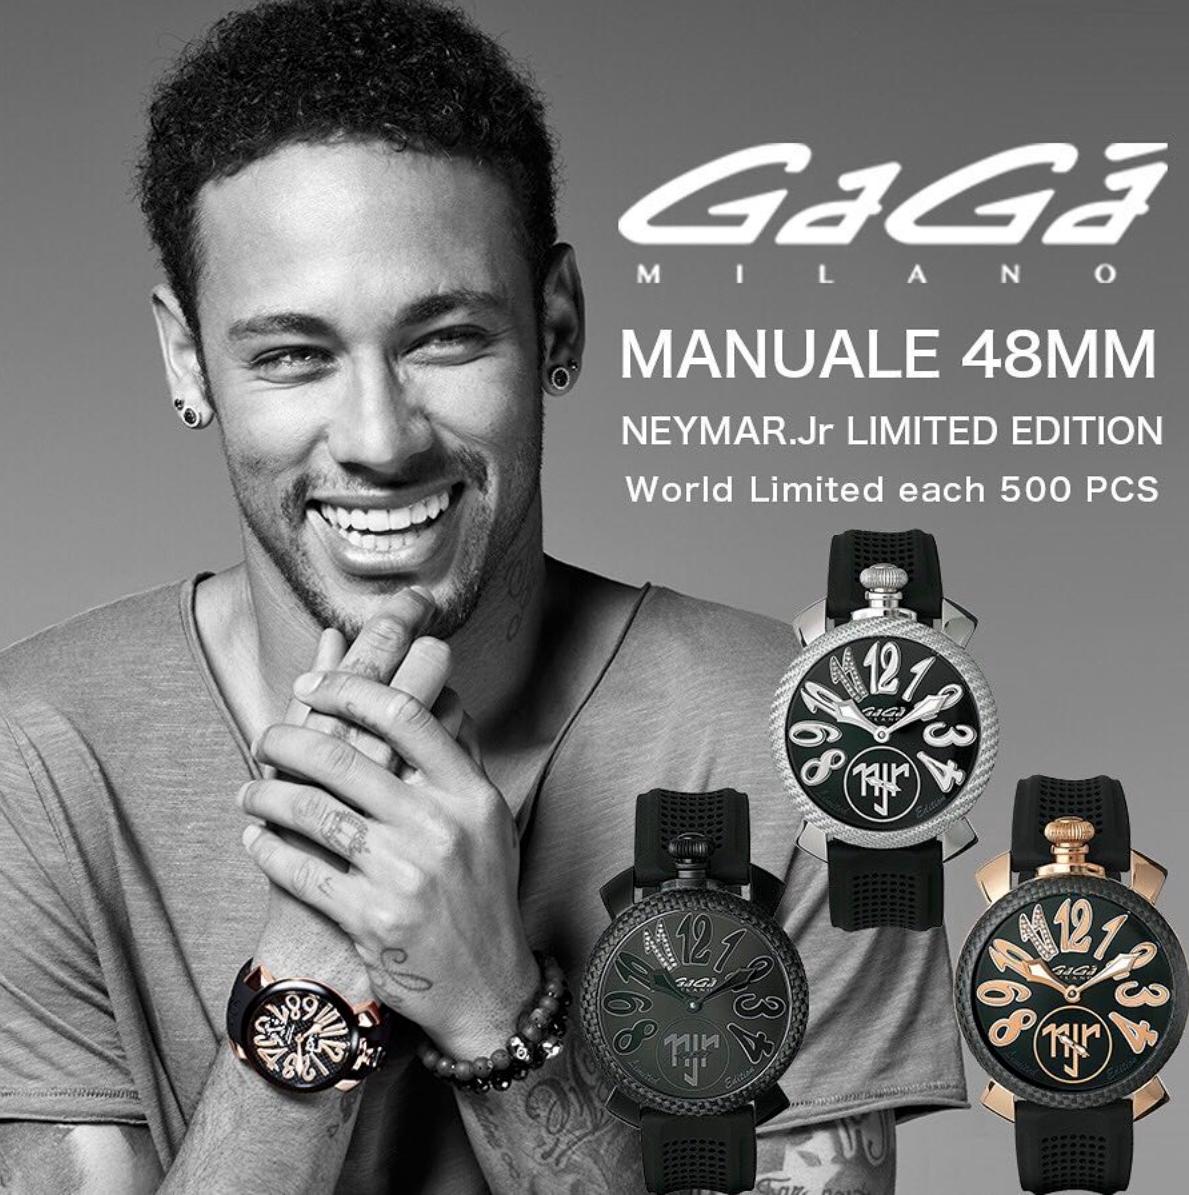 【GaGa MILANO】5516.NJ.01D/Manuale 48 限定ネイマールモデル(ブラック)/正規輸入品